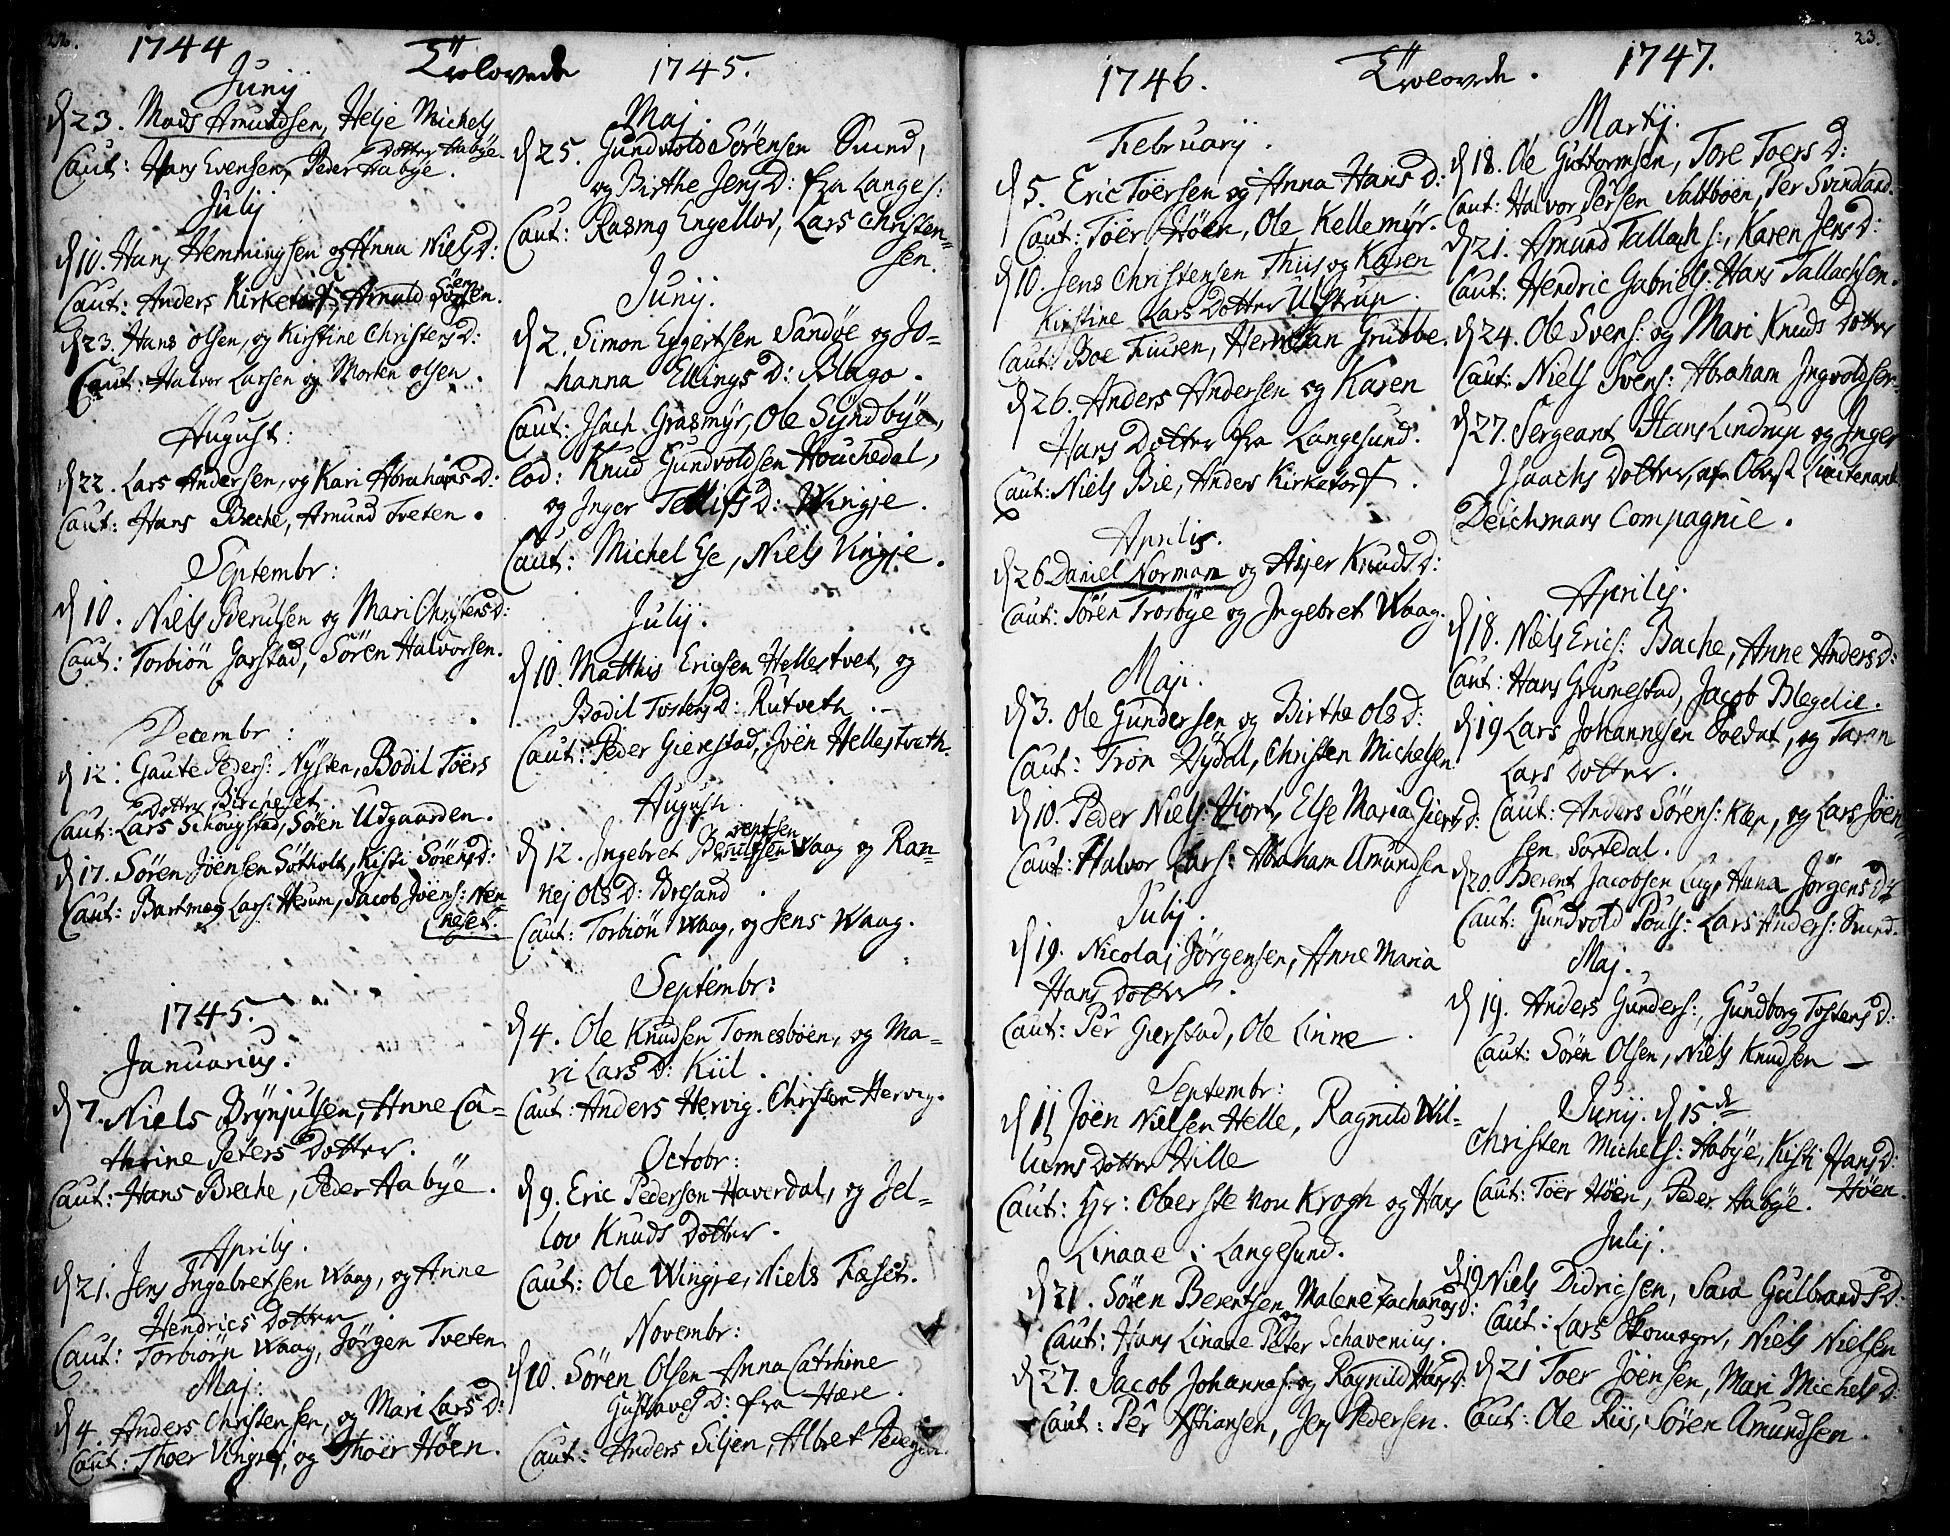 SAKO, Bamble kirkebøker, F/Fa/L0001: Ministerialbok nr. I 1, 1702-1774, s. 22-23